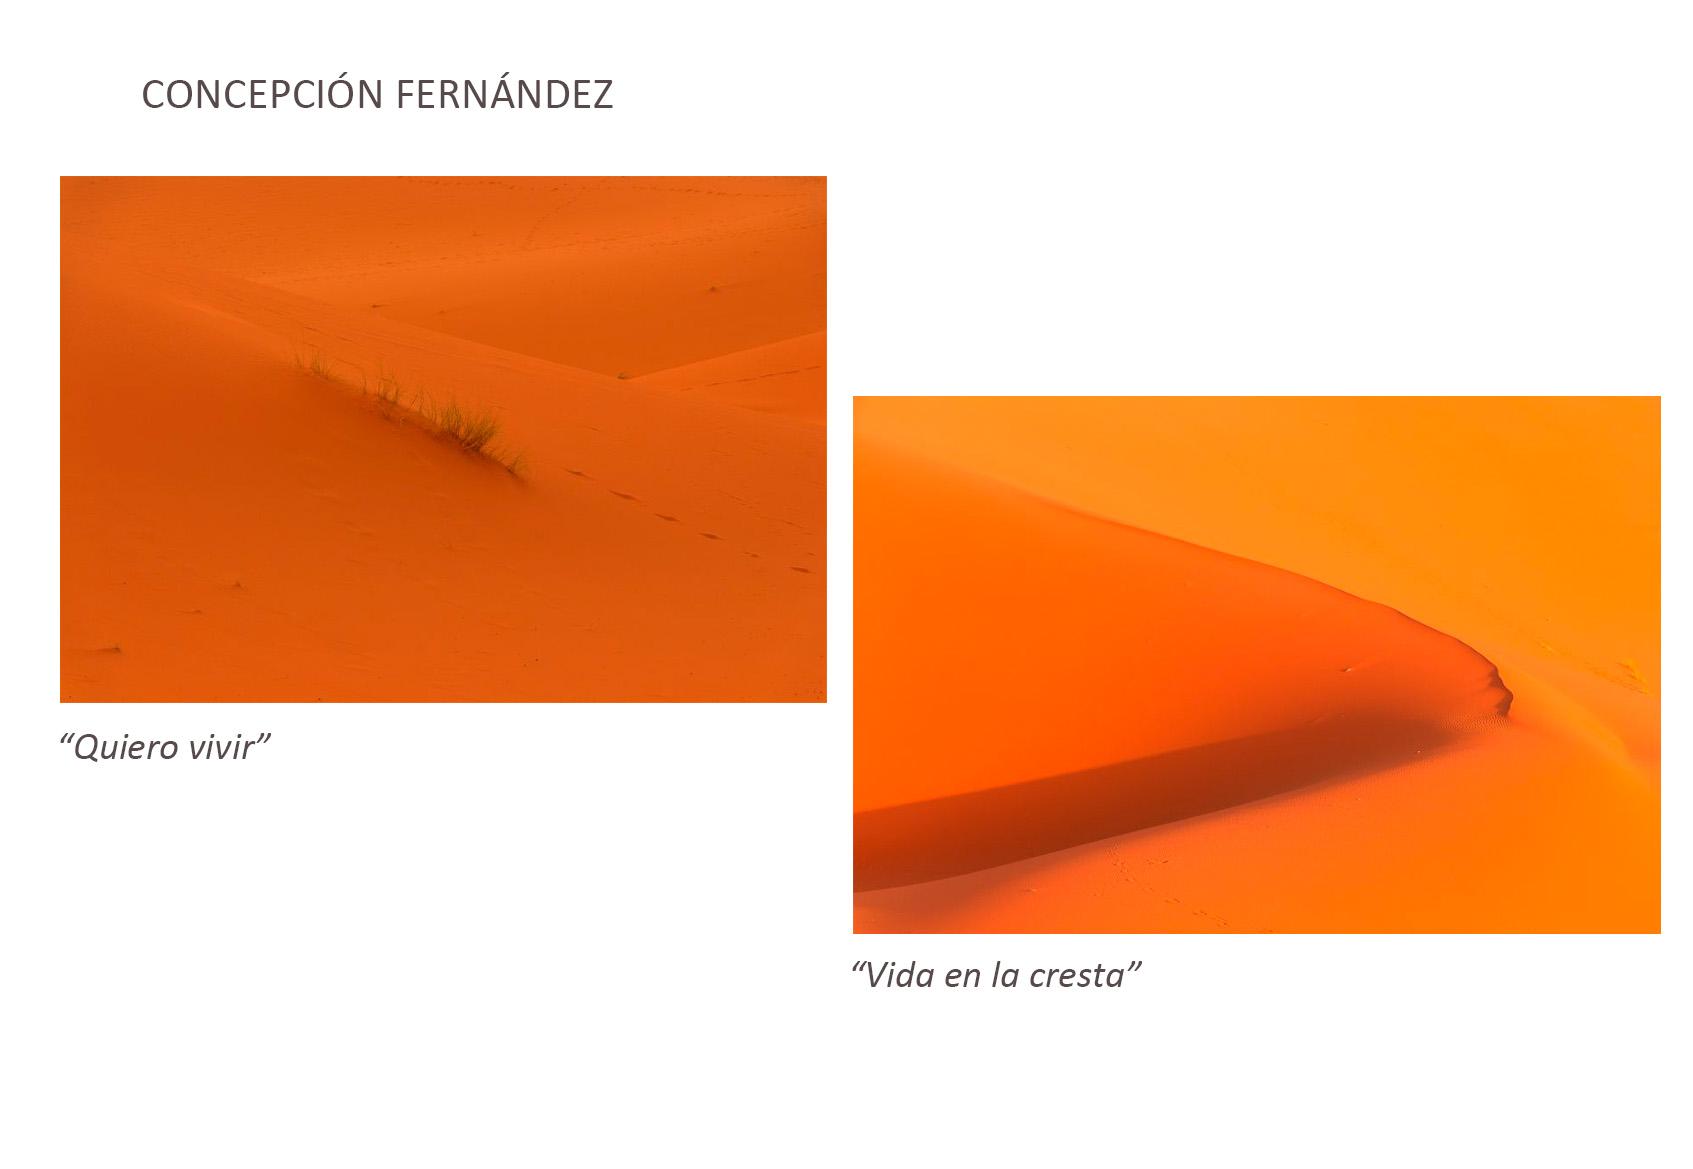 Concepcion_Fernandez